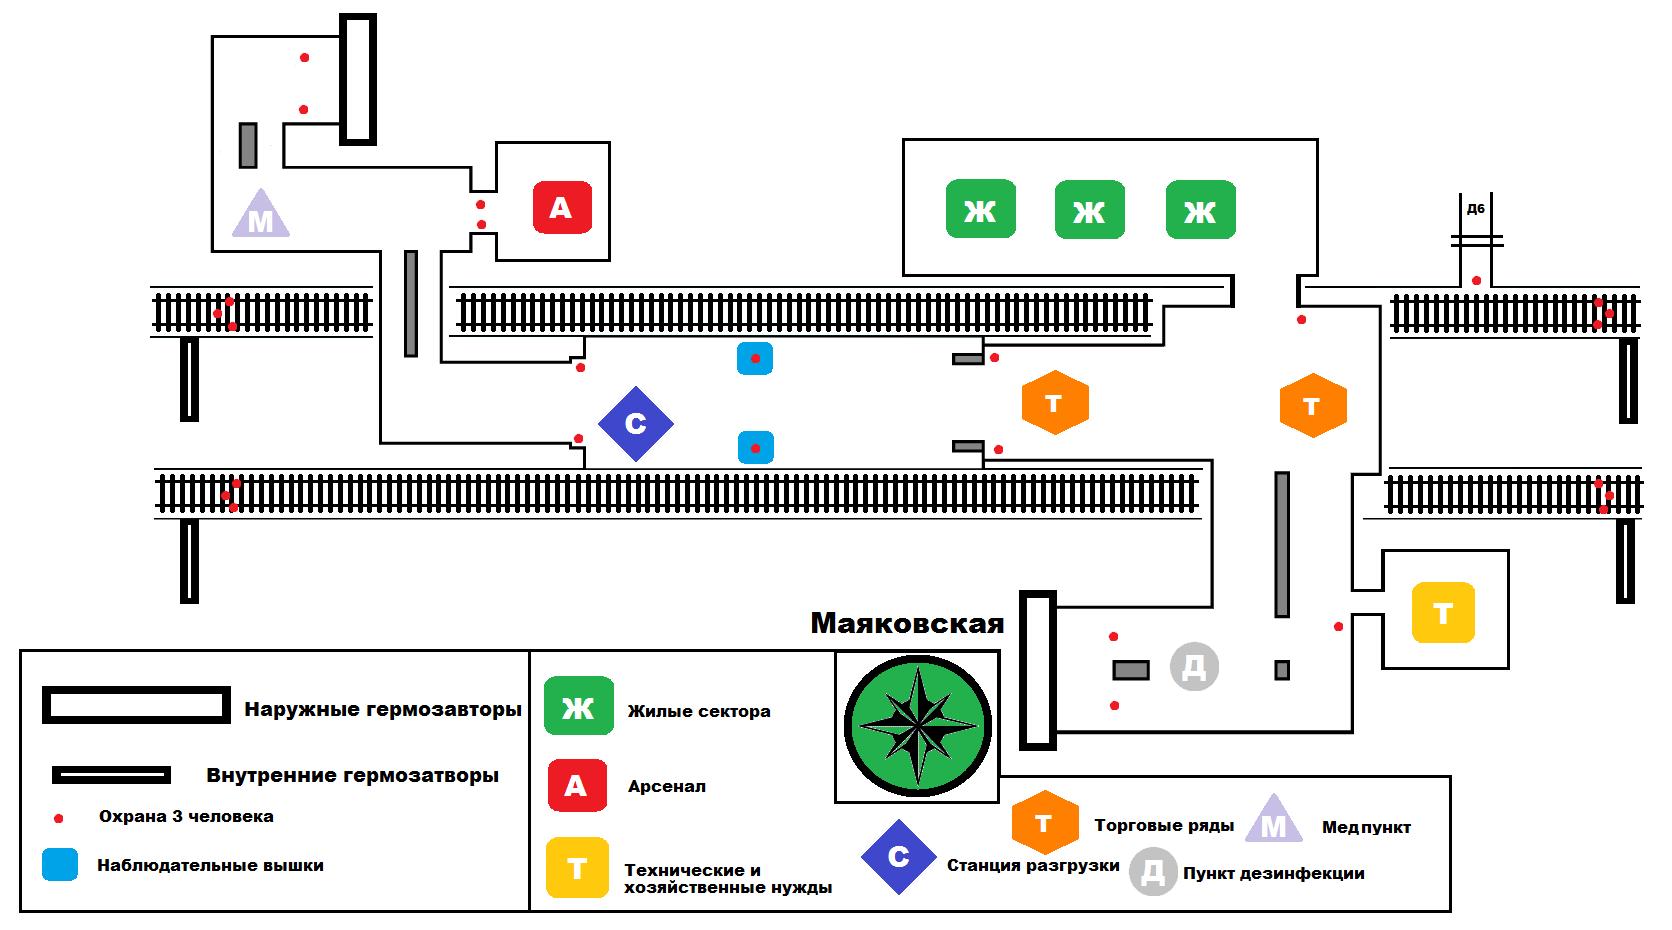 Схема станций метро фото